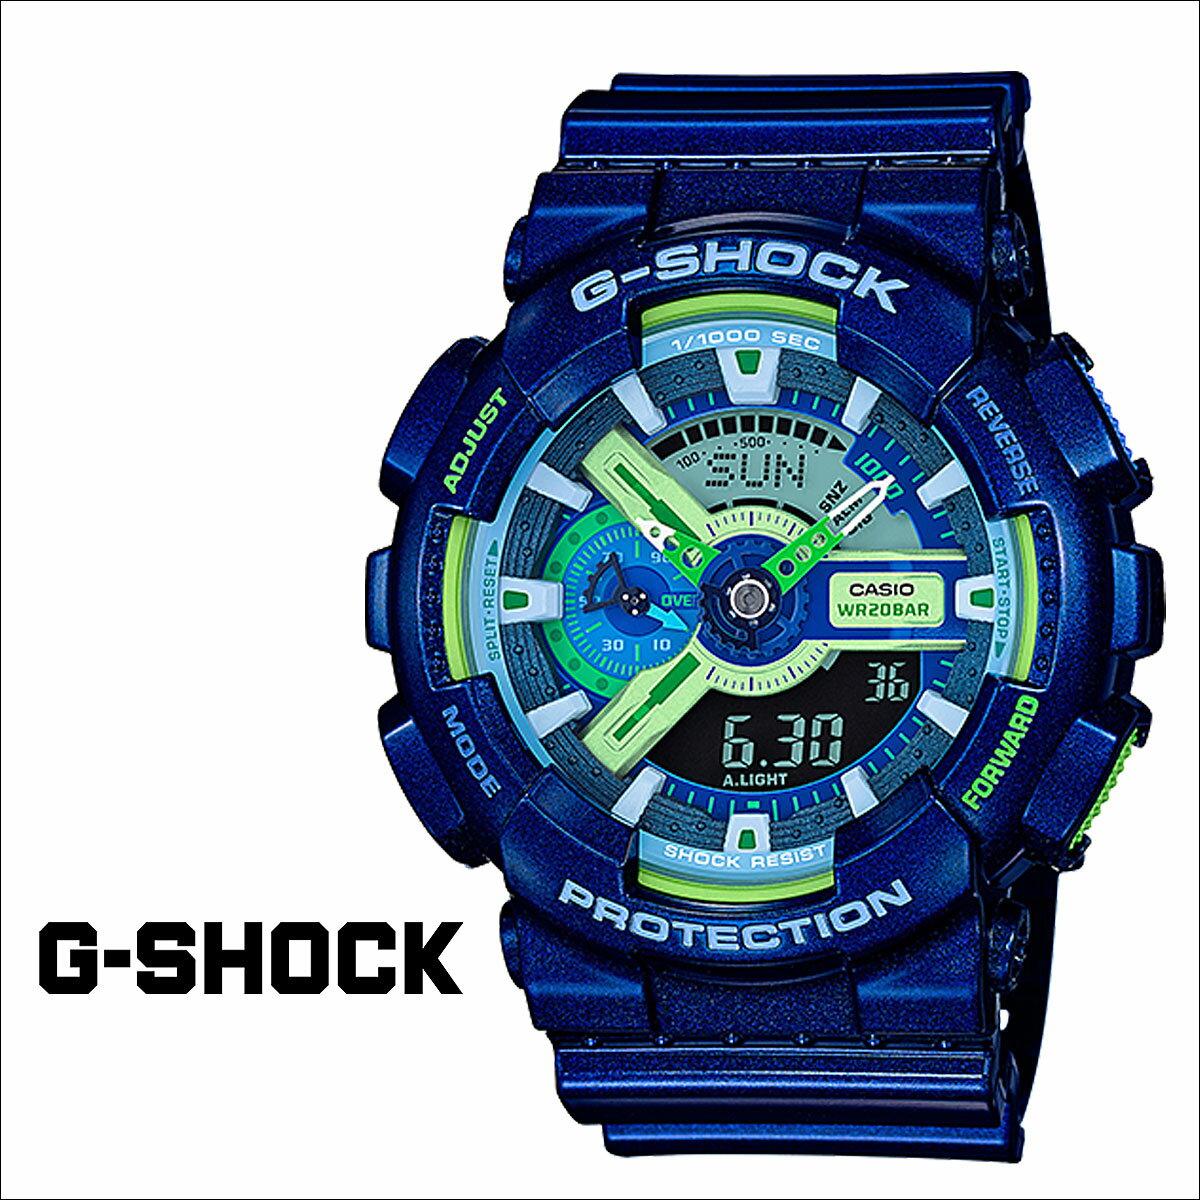 CASIO カシオ G-SHOCK 腕時計  GA-110MC-2AJF  ジーショック Gショック G-ショック  メンズ CASIO正規代理店 送料無料  ジーショック g-shock mini  時計 Gショック 腕時計 正規  通販